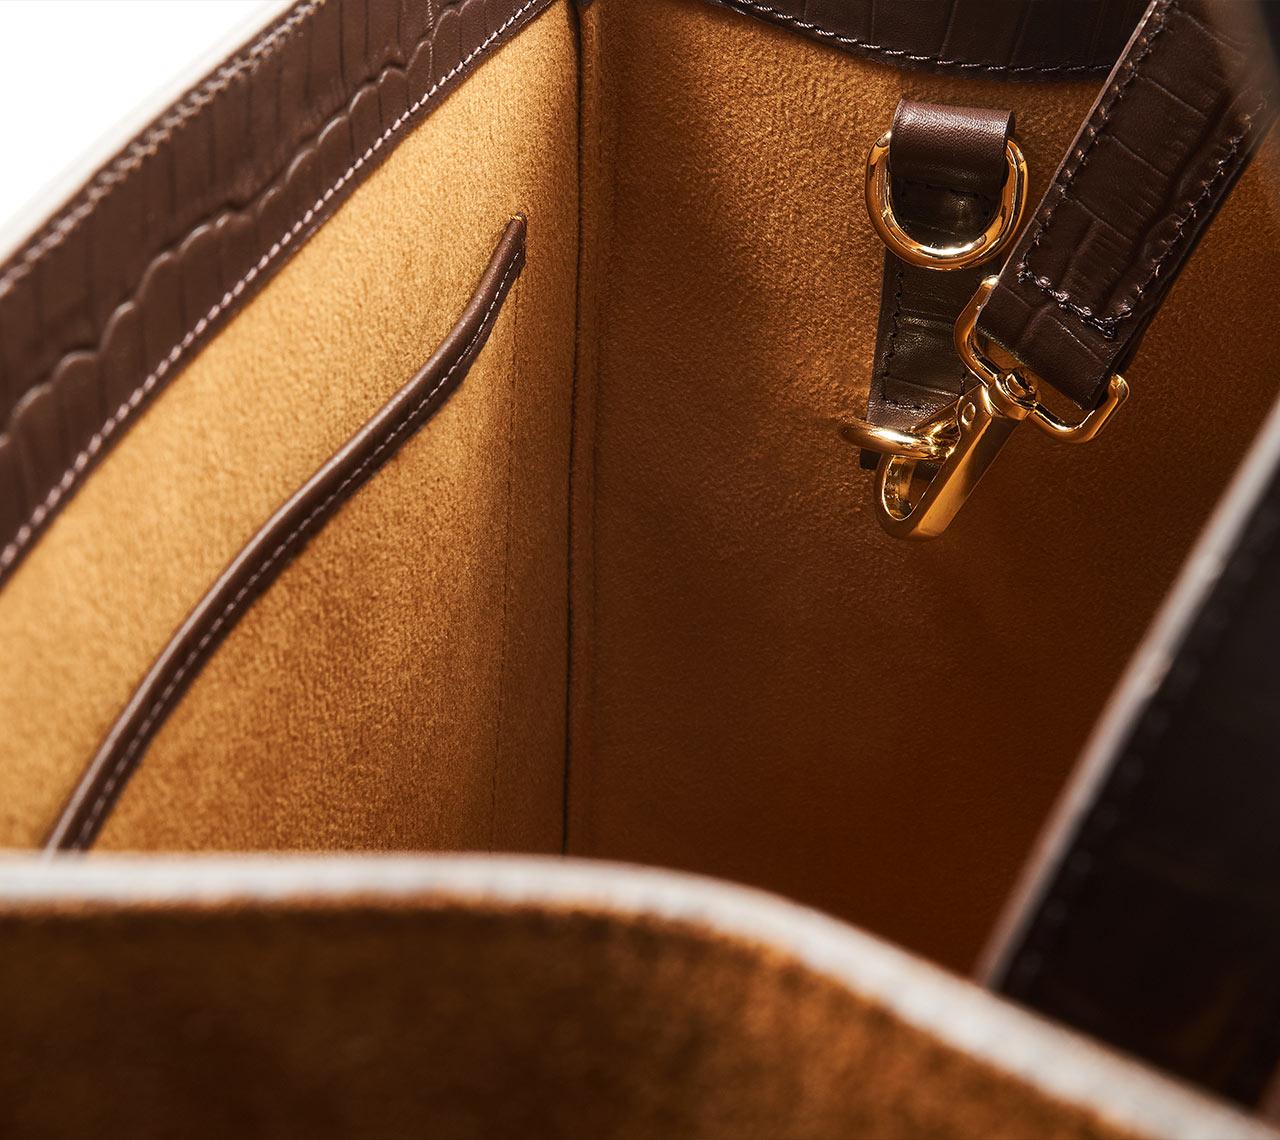 Soofre Tote Bag Premium Lining